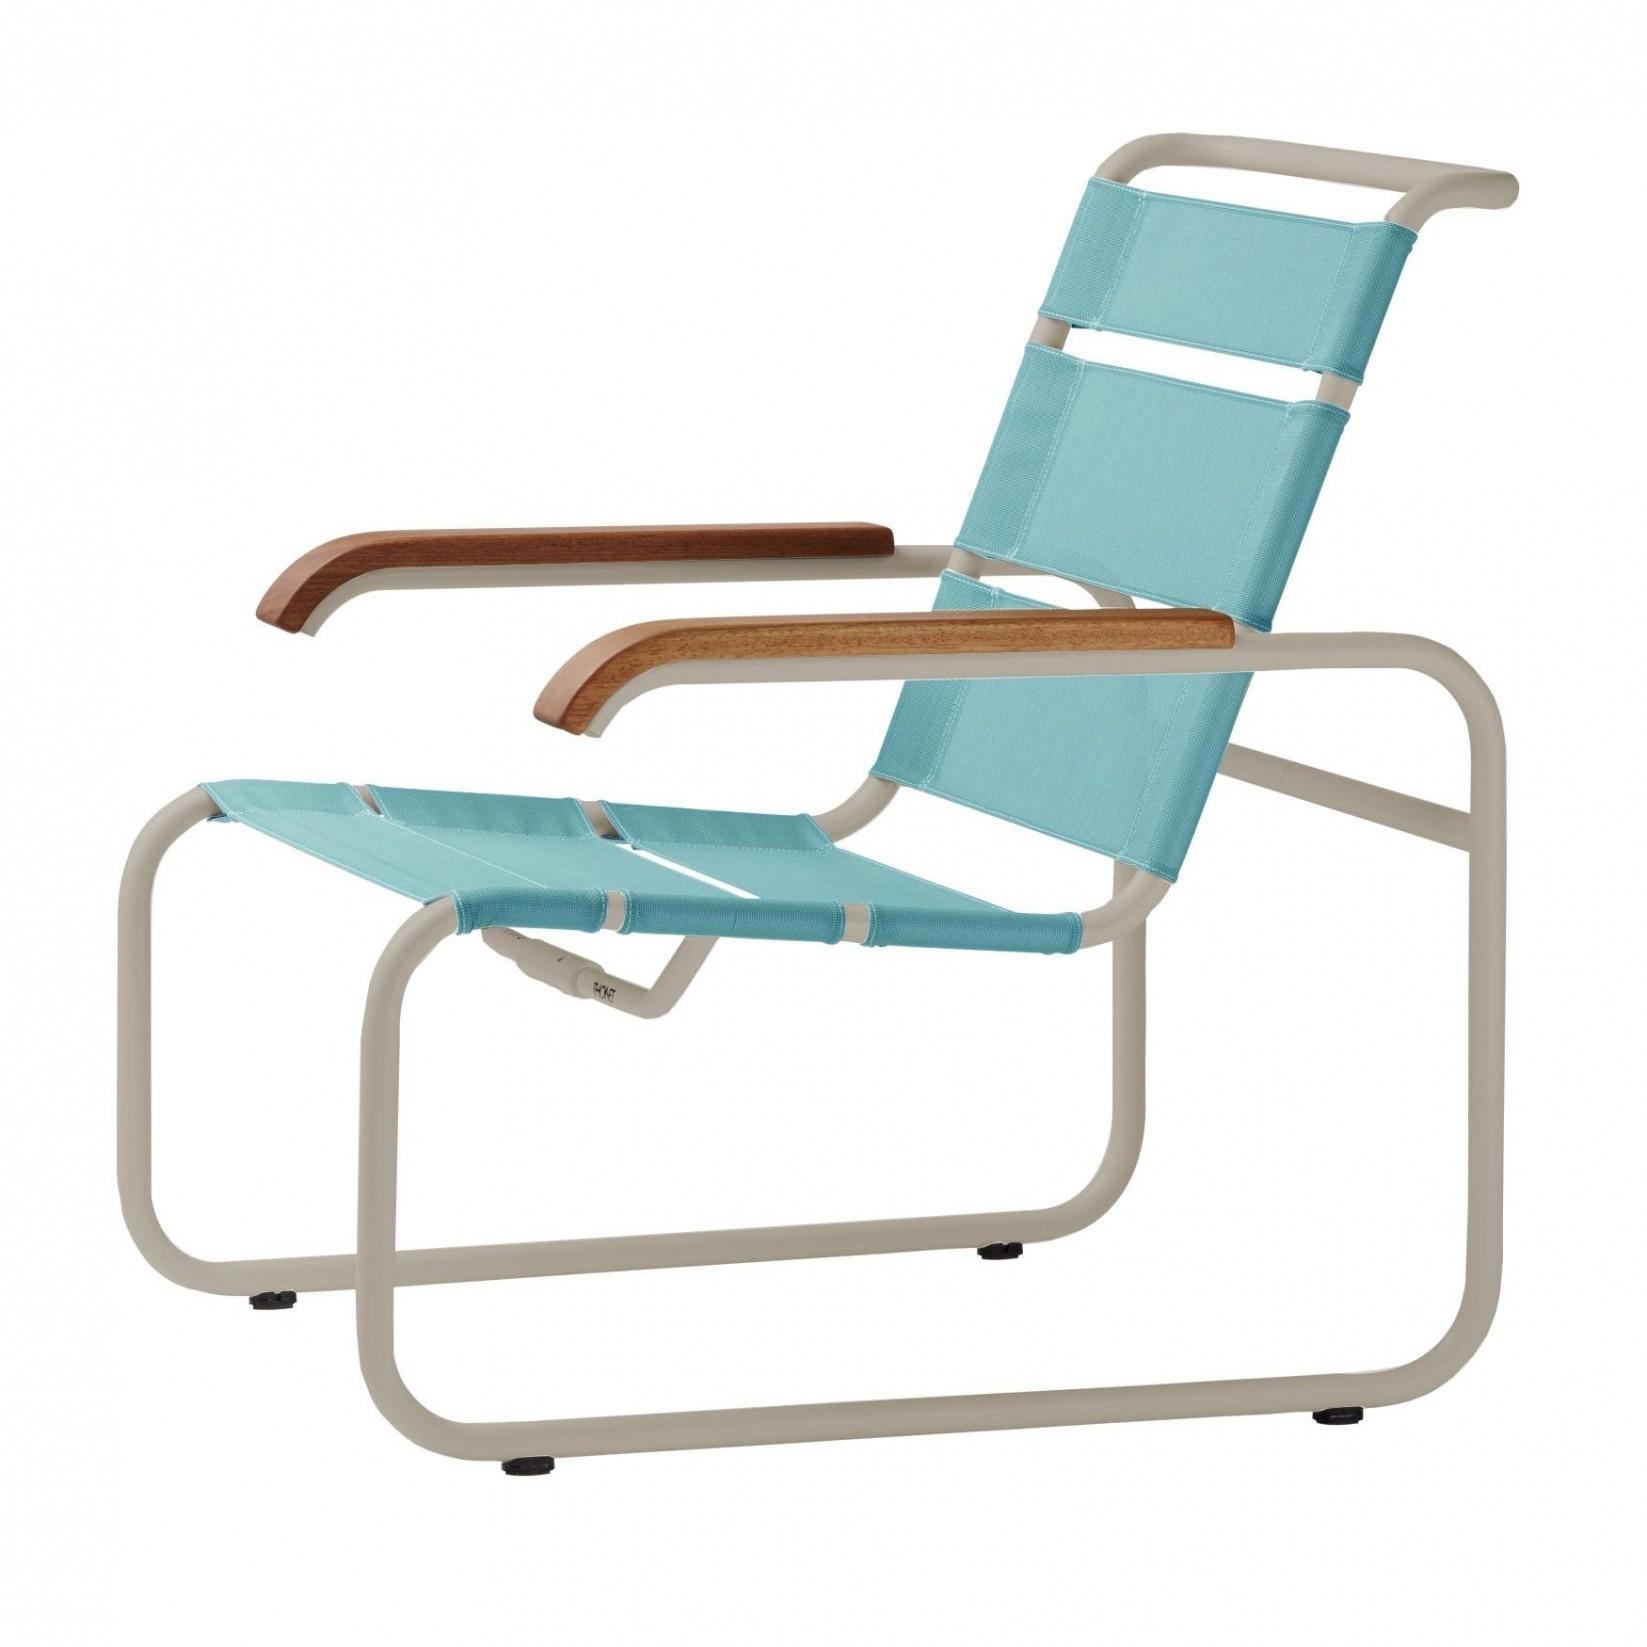 Pleasing Thonet S 35 N All Seasons Garden Lounge Chair Cjindustries Chair Design For Home Cjindustriesco